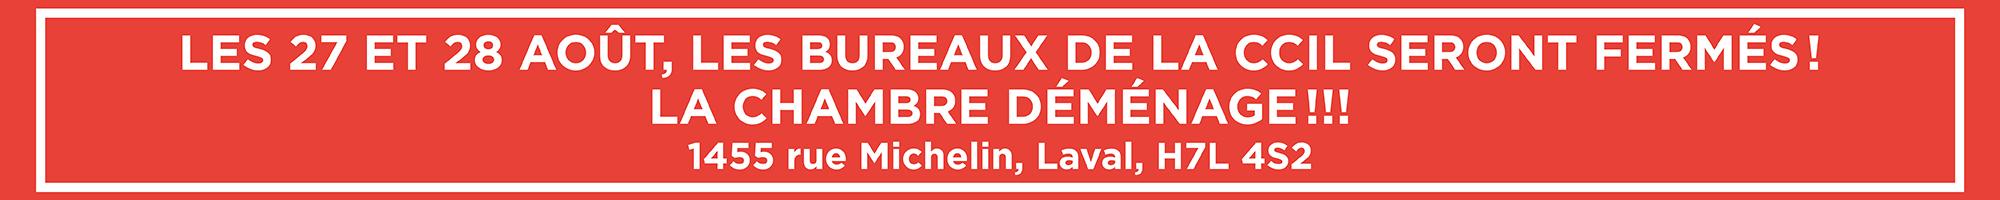 BureauxFermé_Déménagement_Slider_2000x200